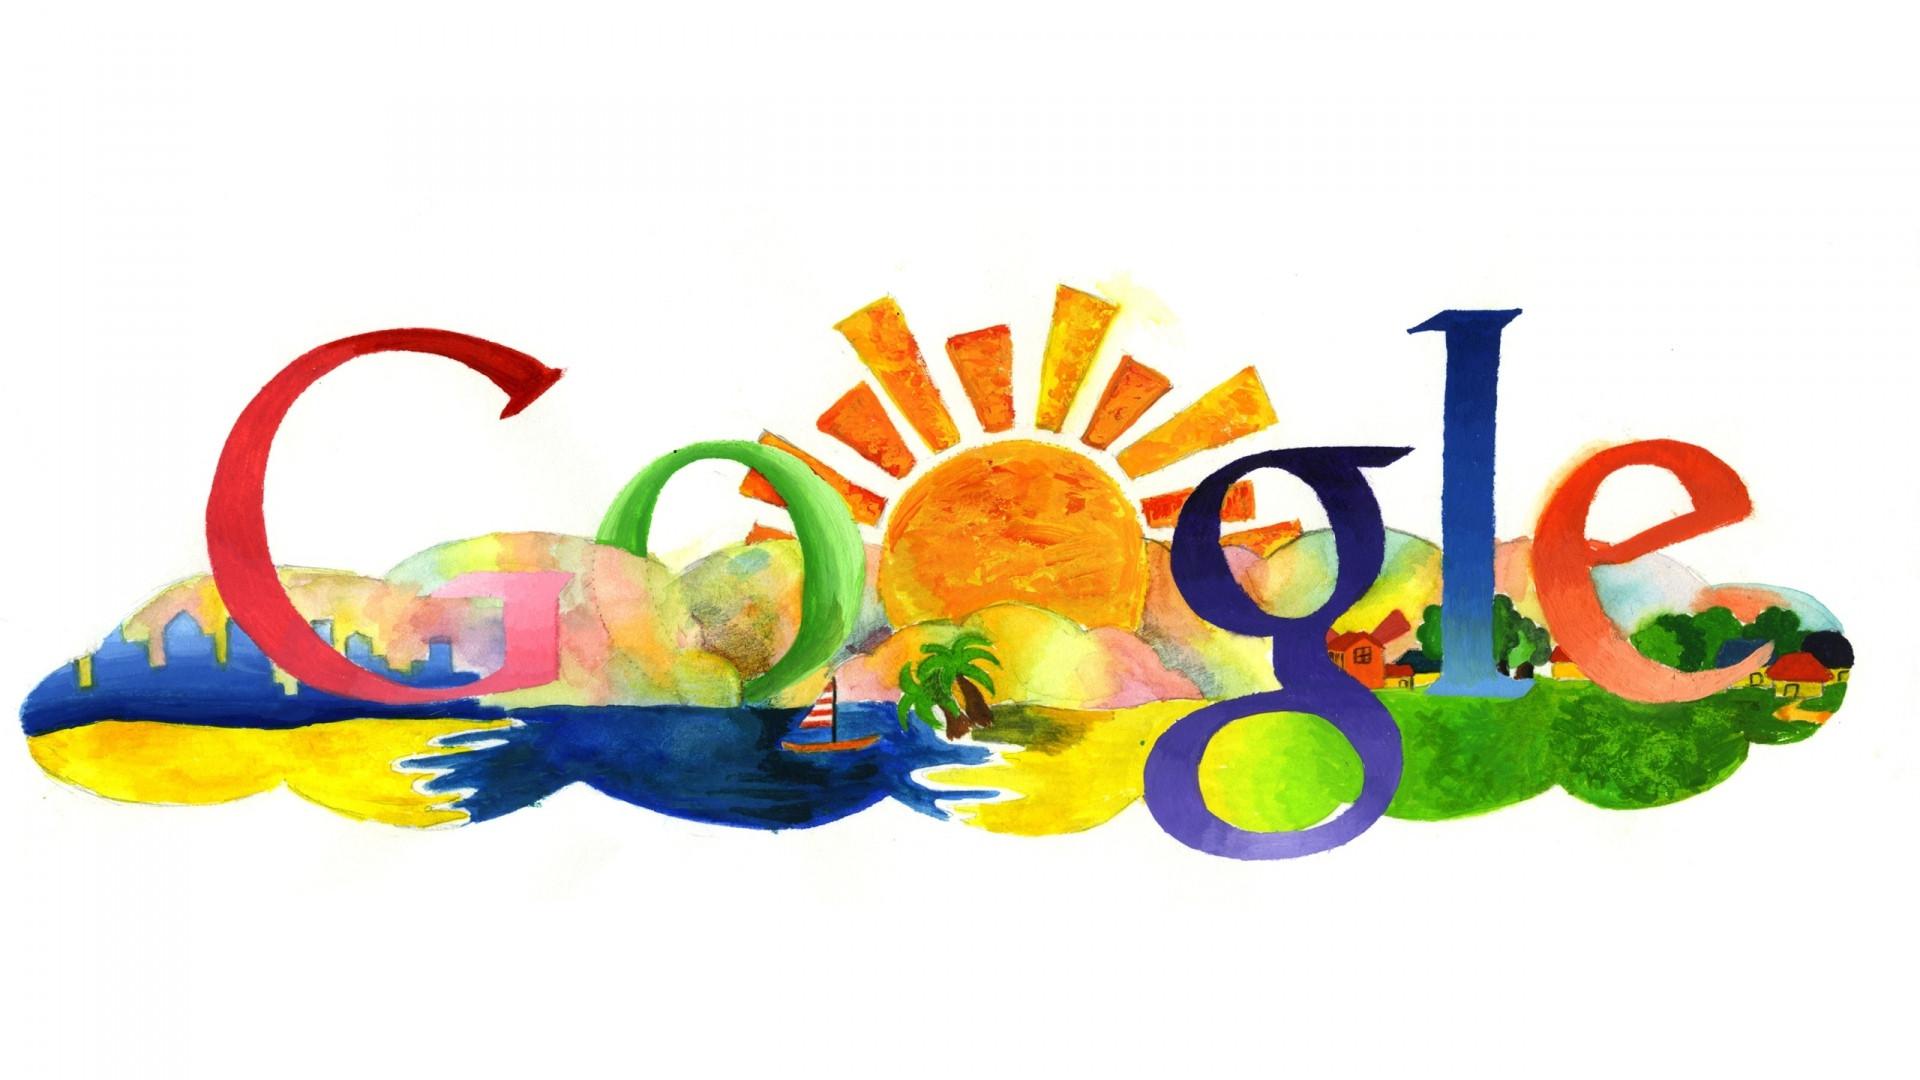 wao-beautiful-art-google-hd-wallpapers-free-search-engine